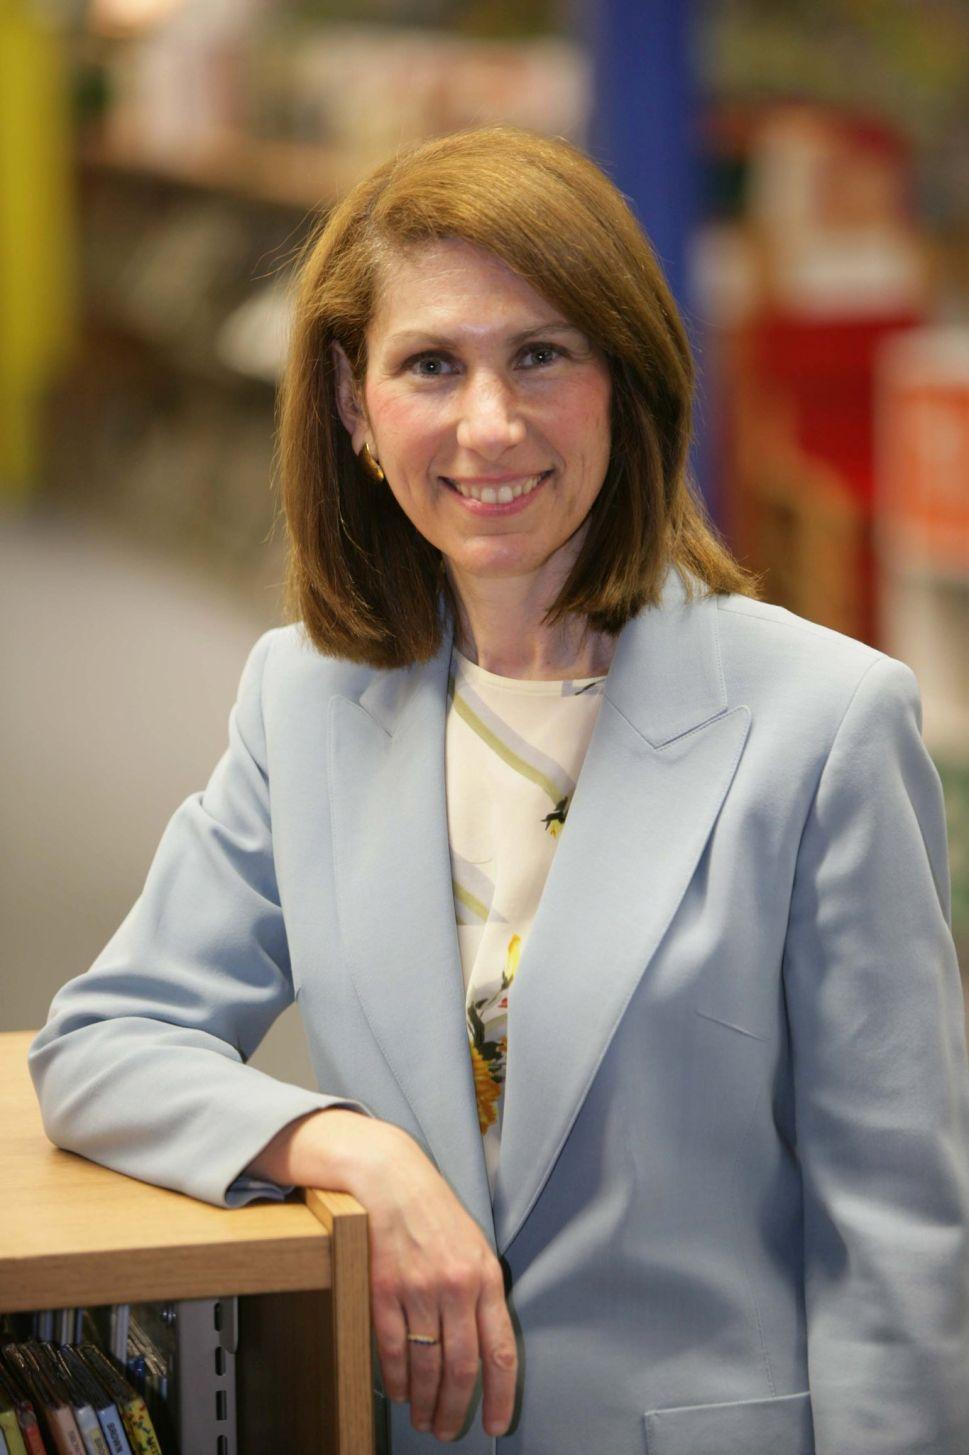 BREAKING: Amy Handlin Dropping Bid to Replace Kyrillos in NJ State Senate